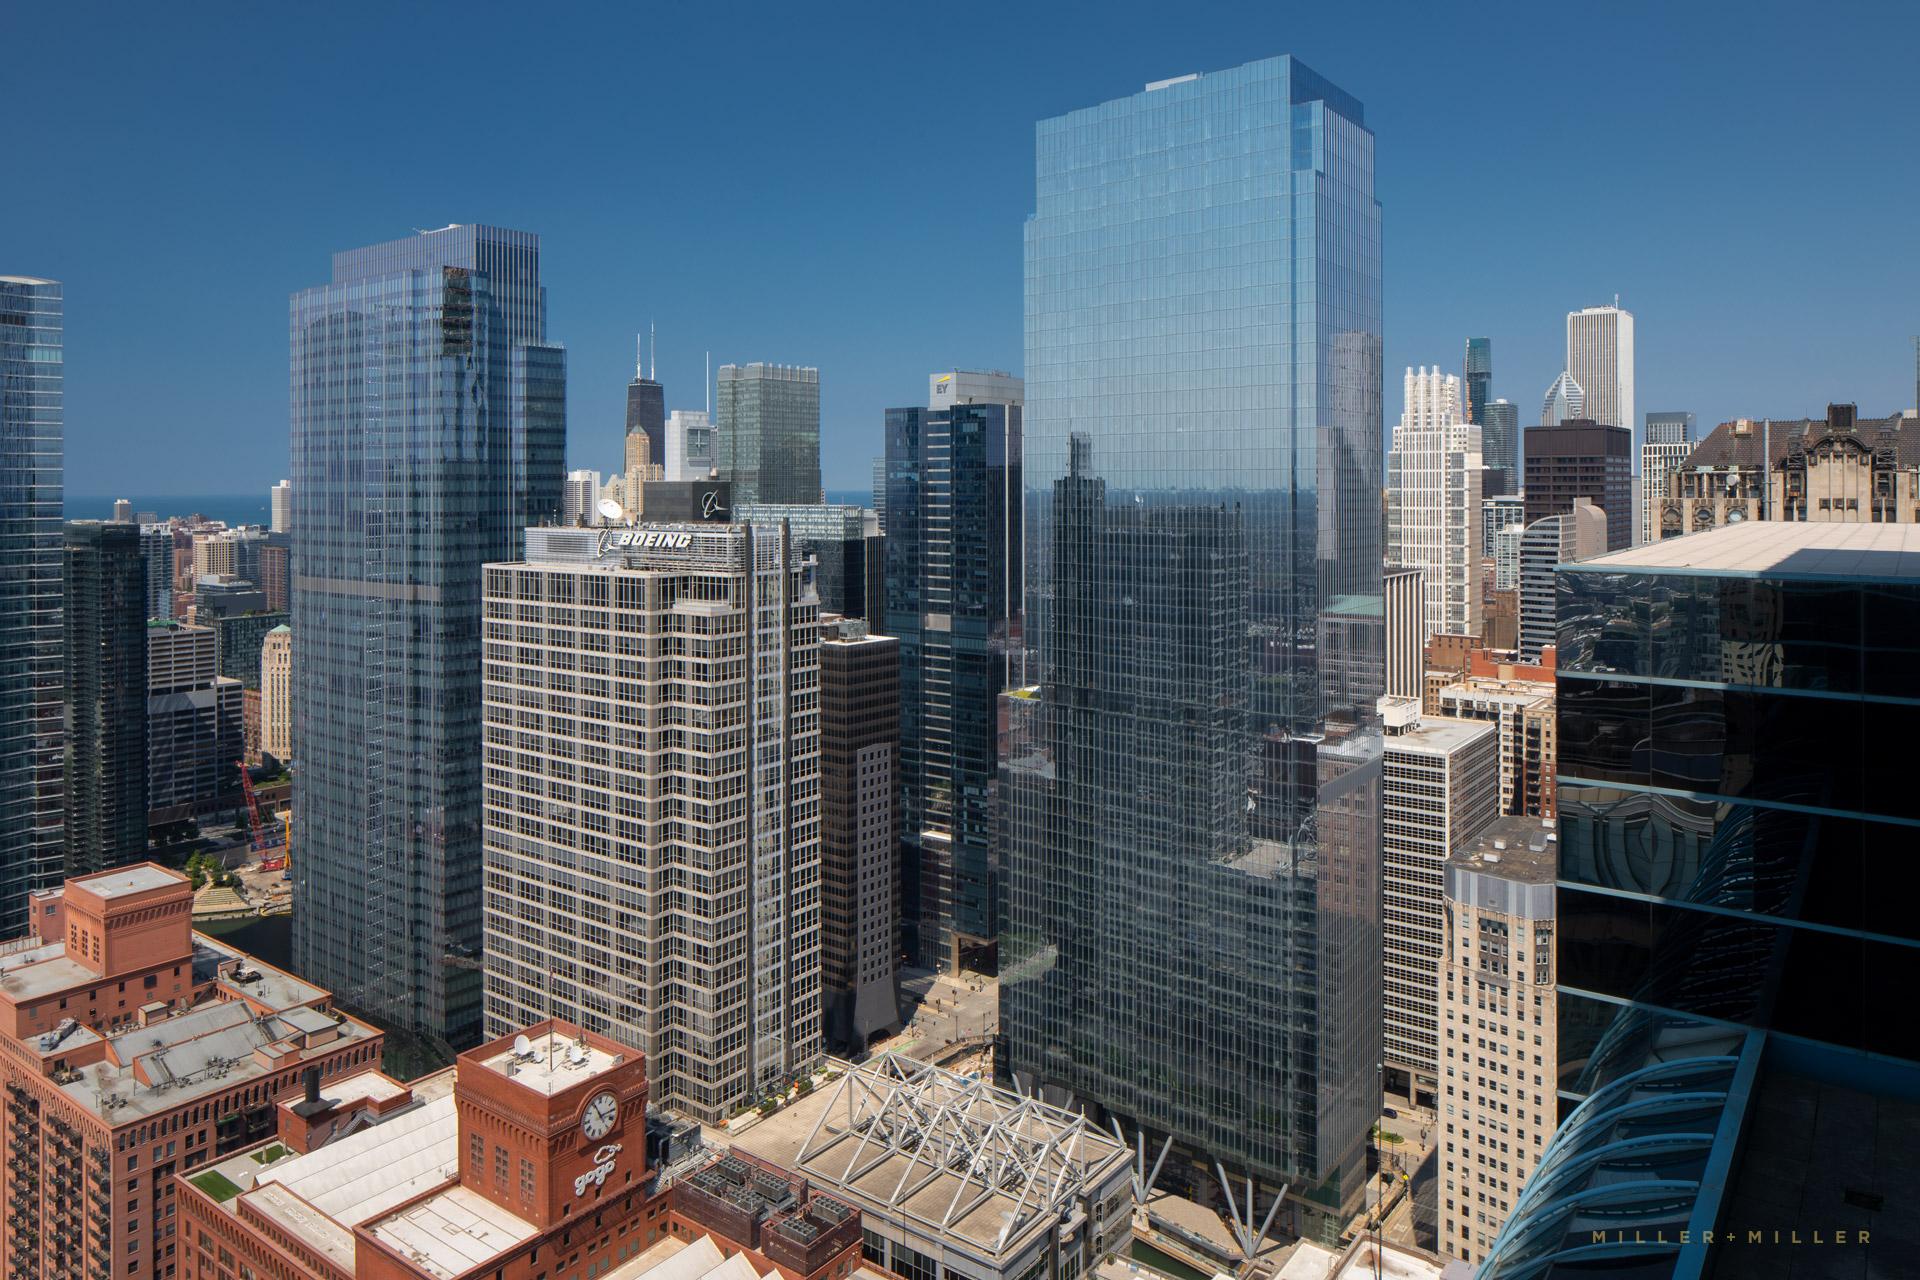 110-n-wacker-chicago-skyscraper-building-photography